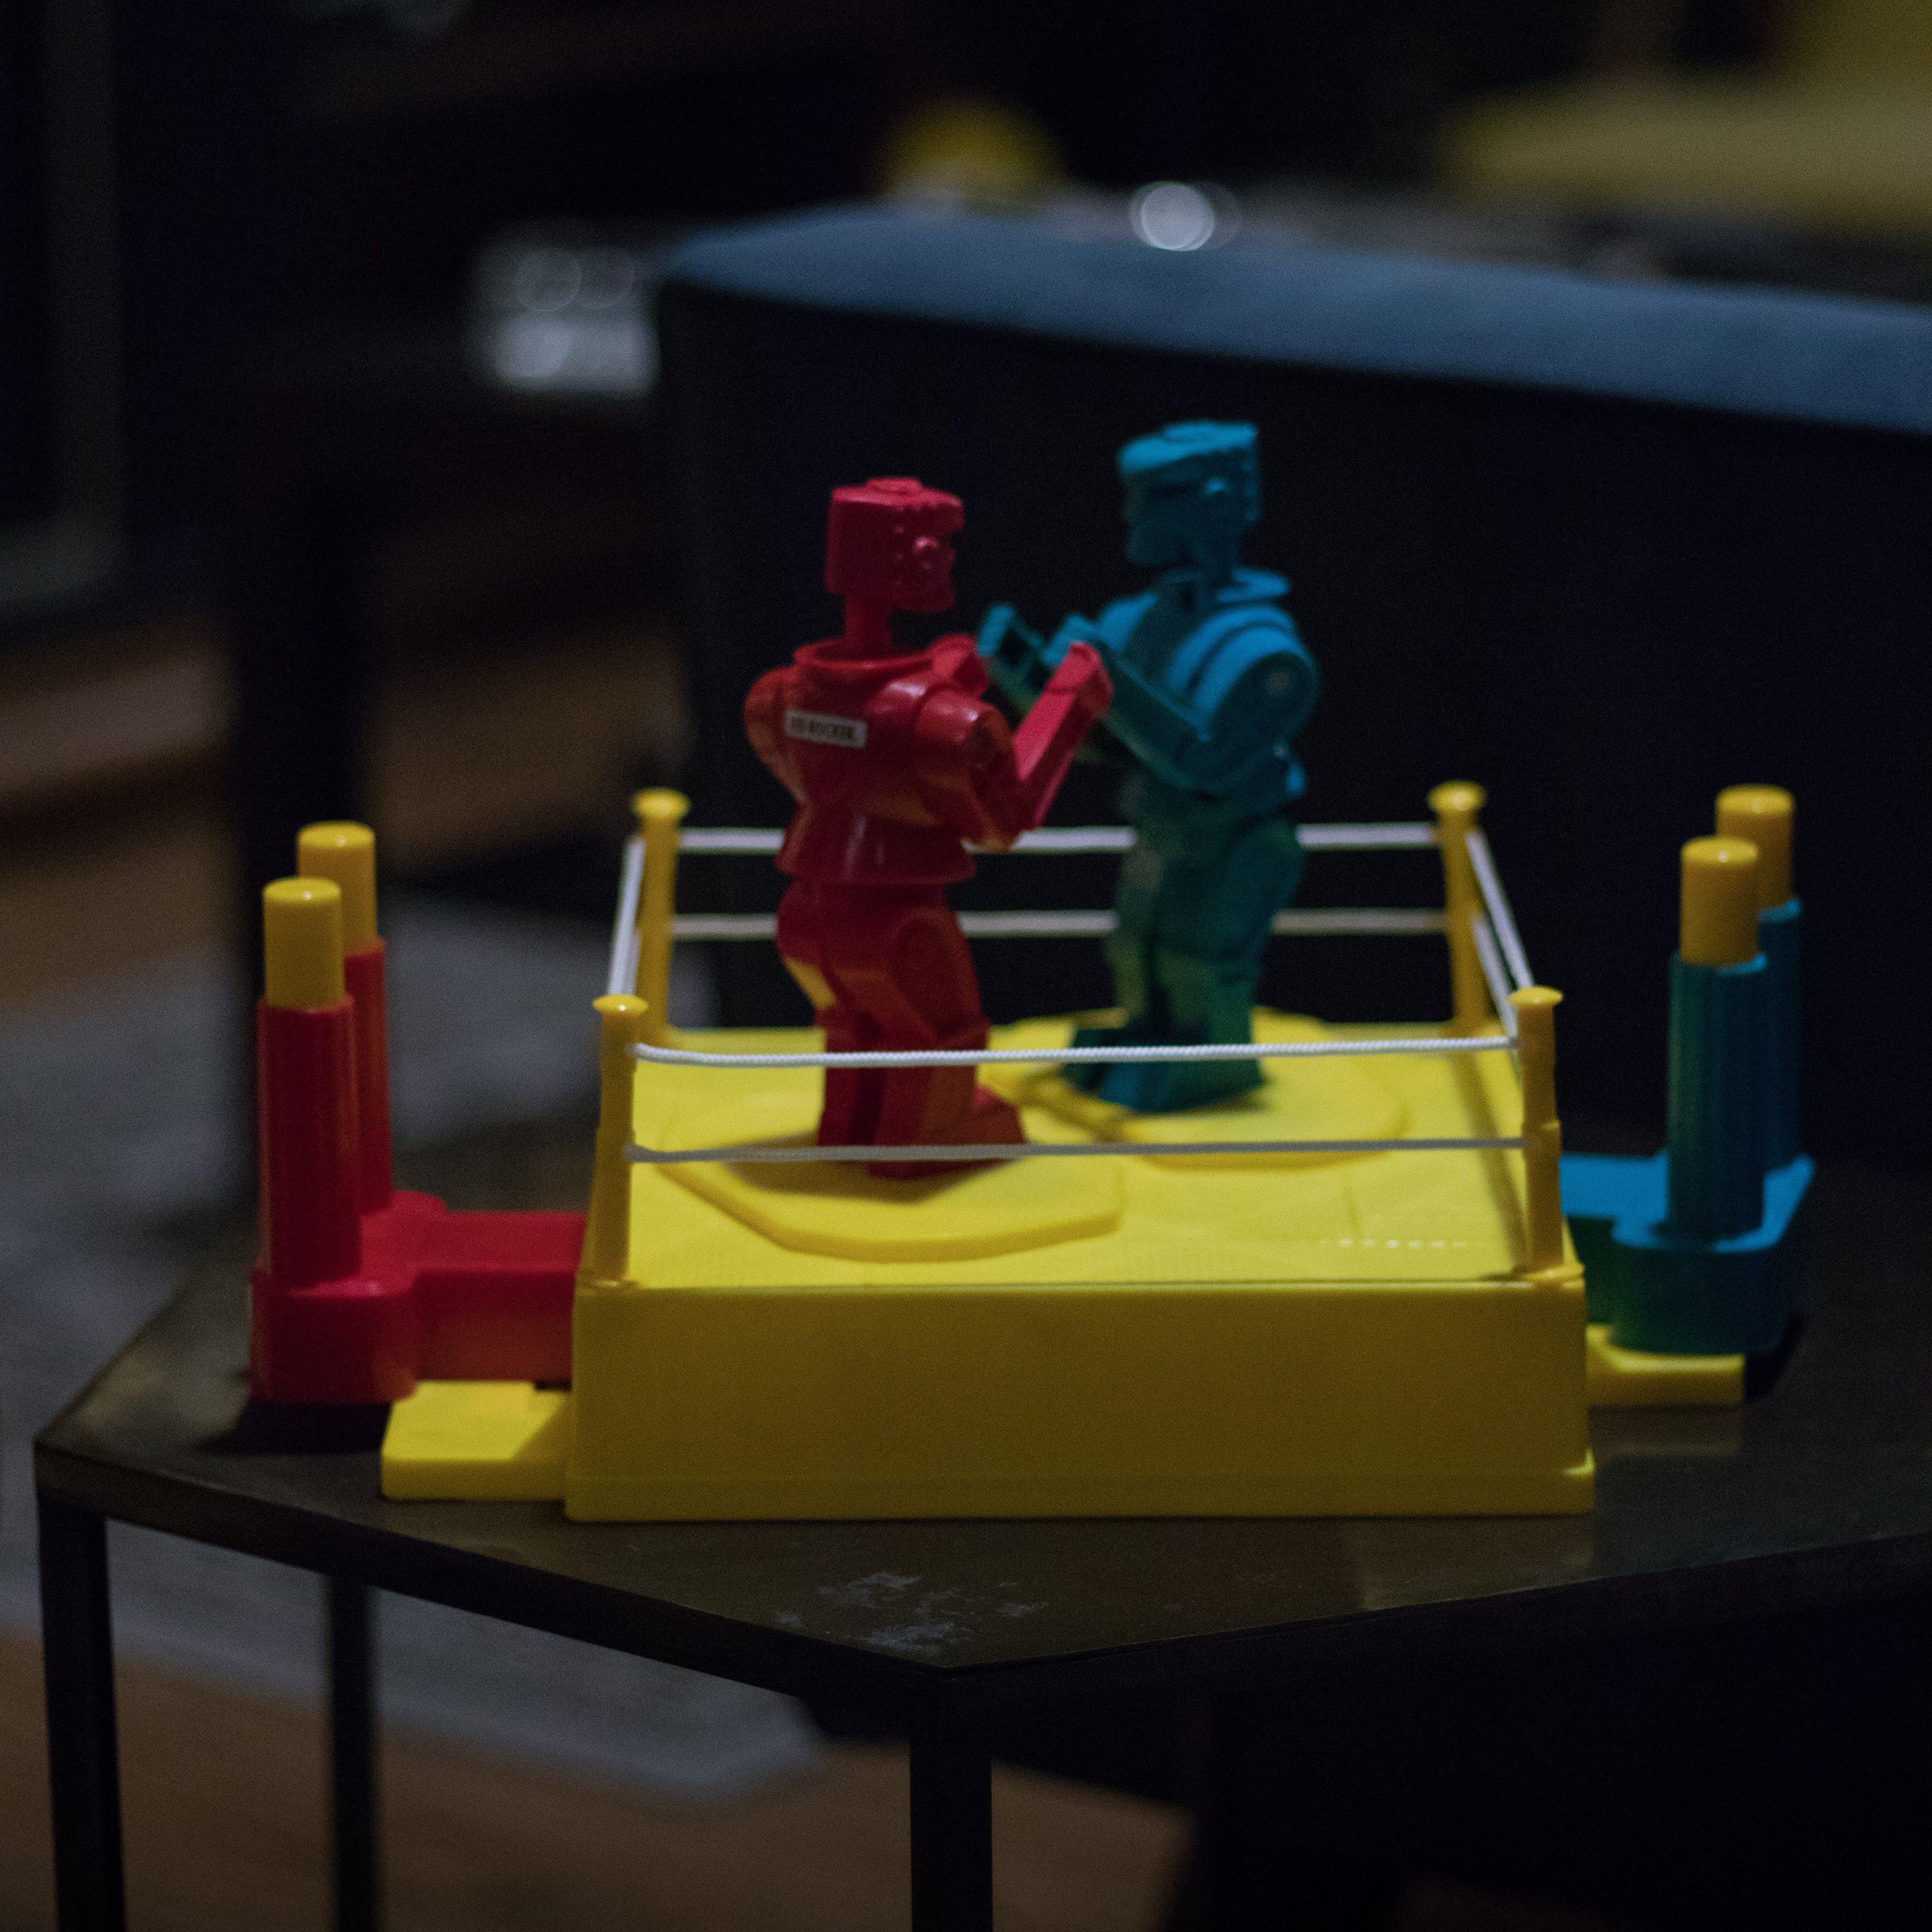 Free stock photo of fight, Robots, rockem sockem, toy